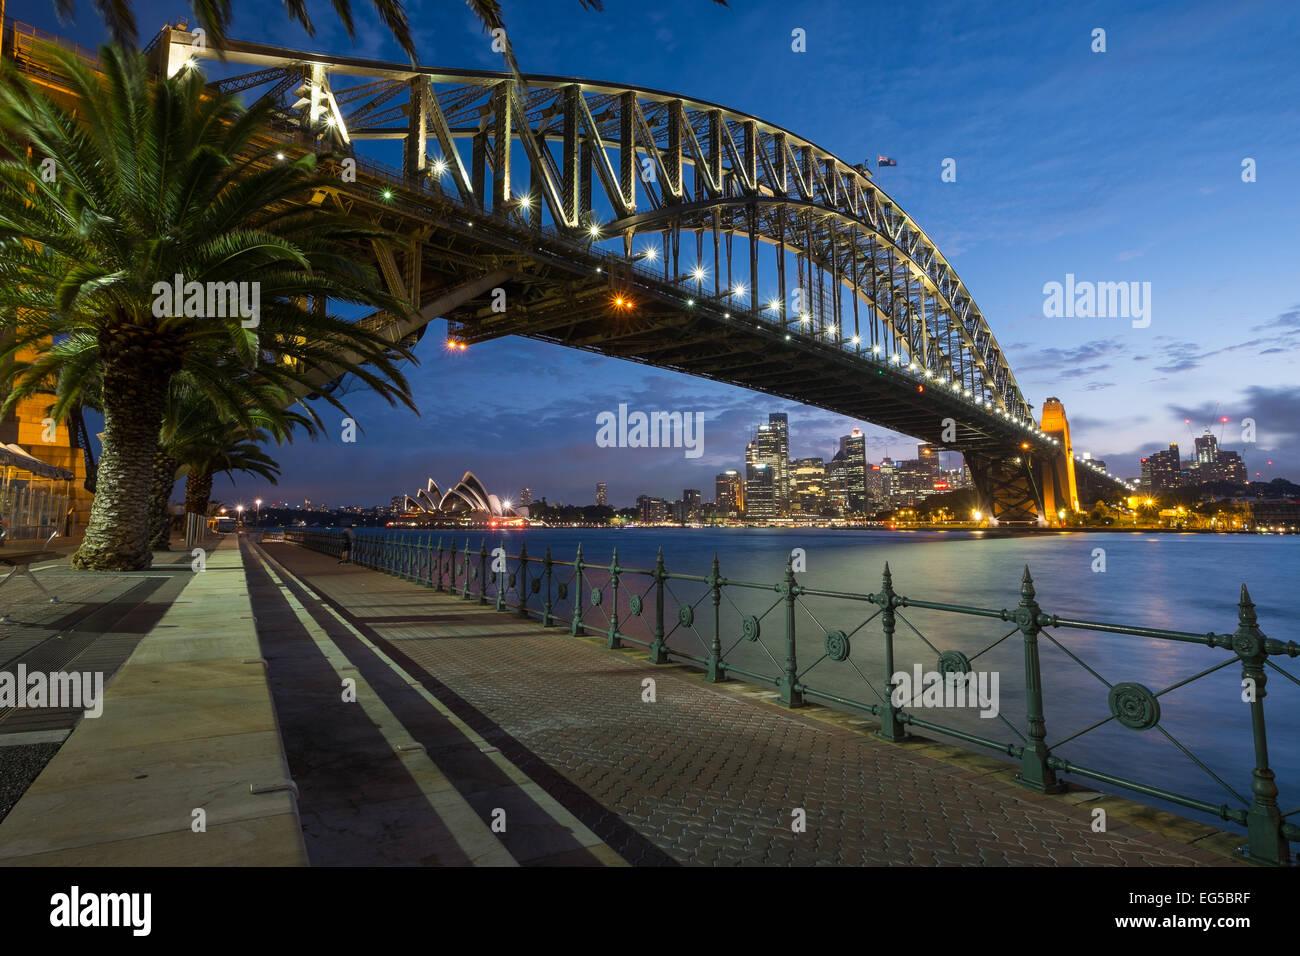 SYDNEY, AUSTRALIA- JANUARY 5, 2015: The iconic Sydney Harbour Bridge with Sydney Opera House in the background at Stock Photo